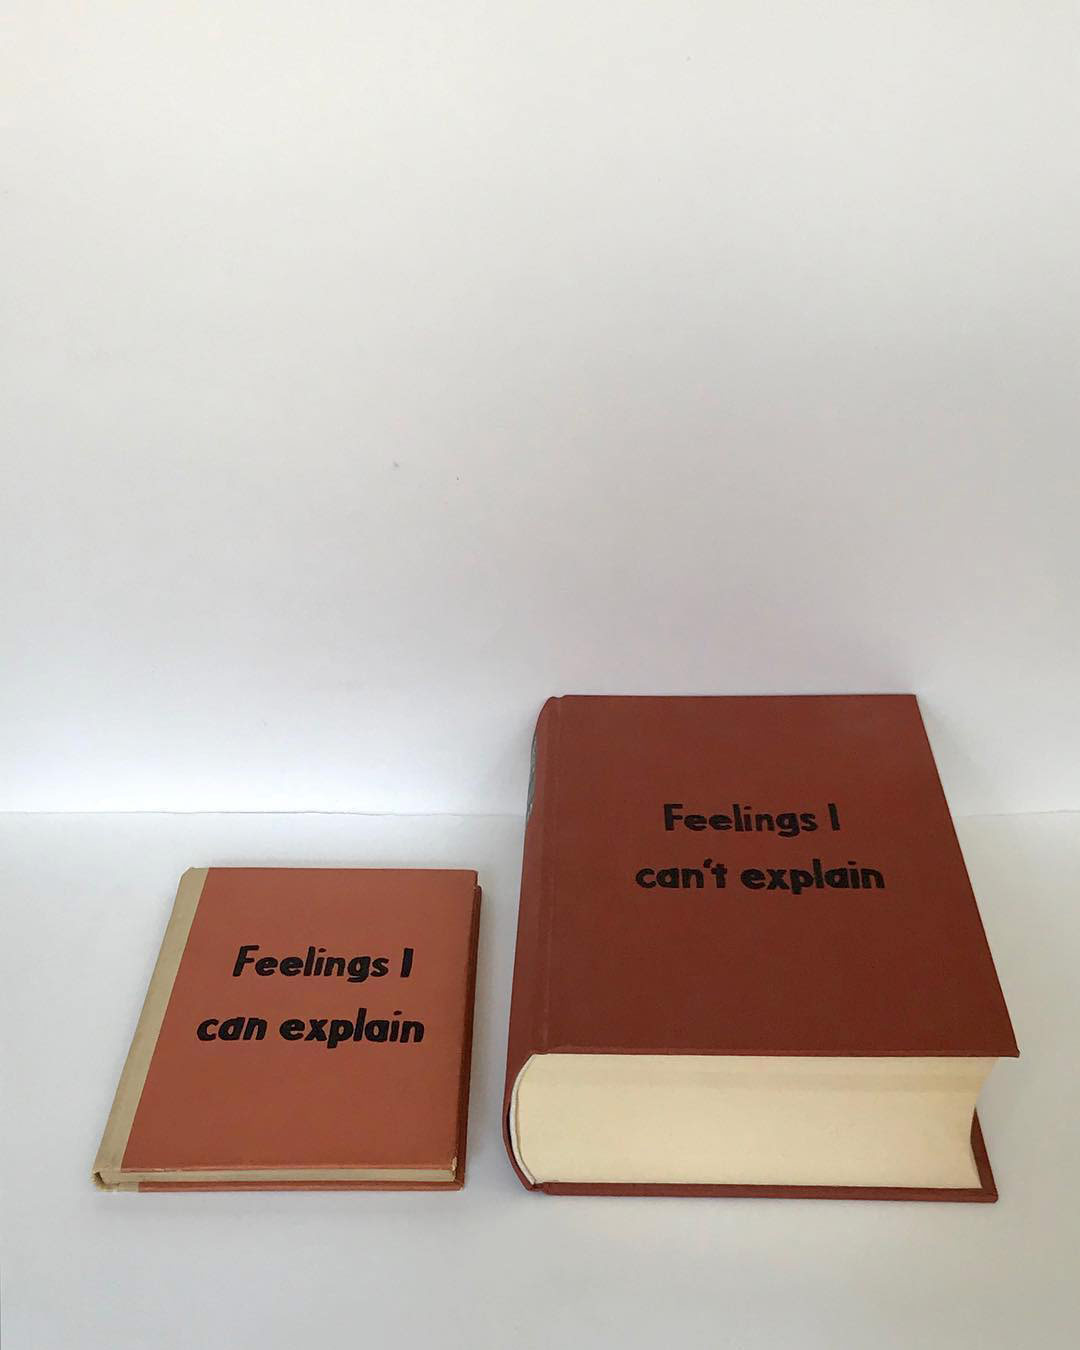 Gli ironici self-help book di Johan Deckmann | Collater.al 12